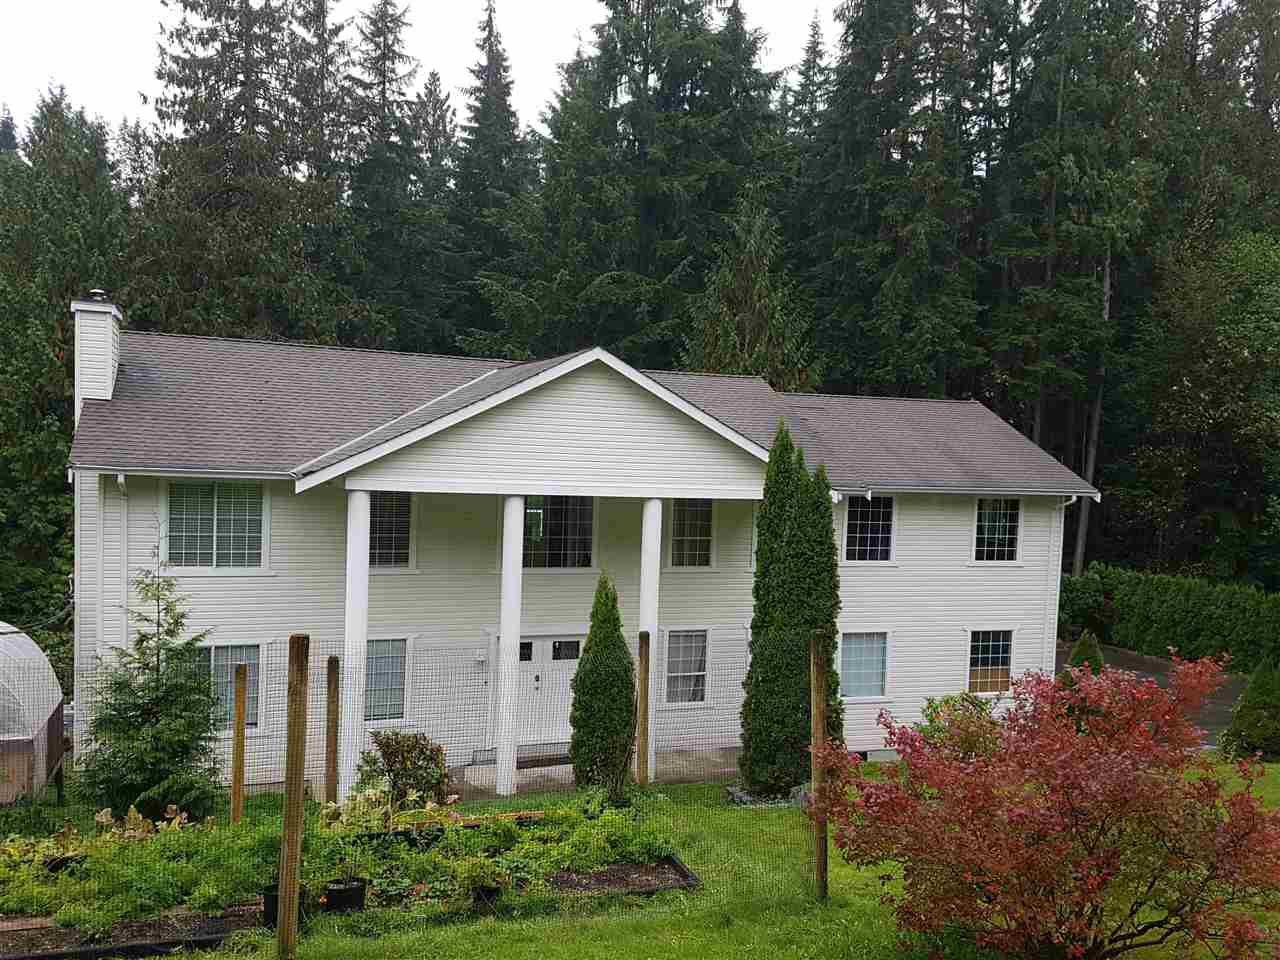 Main Photo: 12251 272 Street in Maple Ridge: Northeast House for sale : MLS®# R2411338